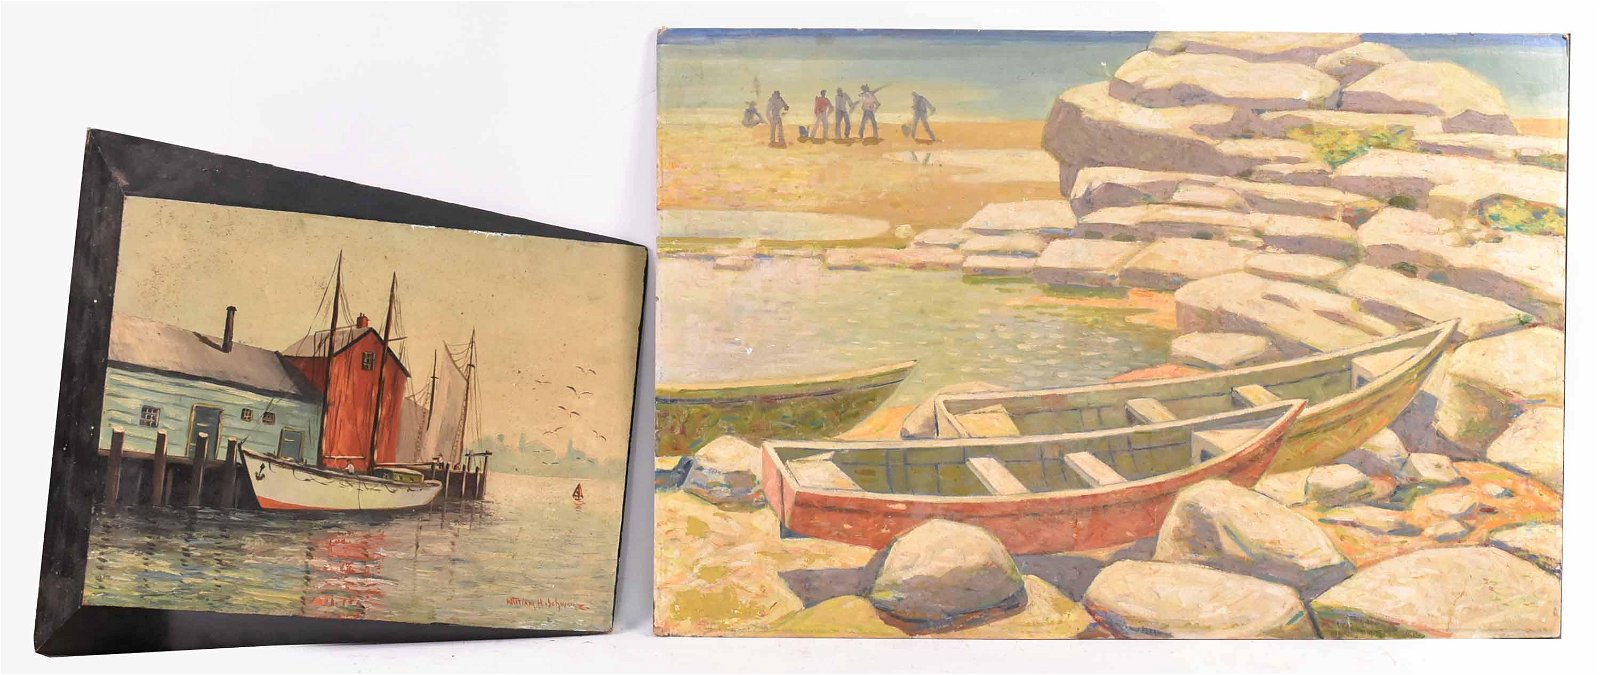 Oil on Masonite, Fishing Boat at Dock